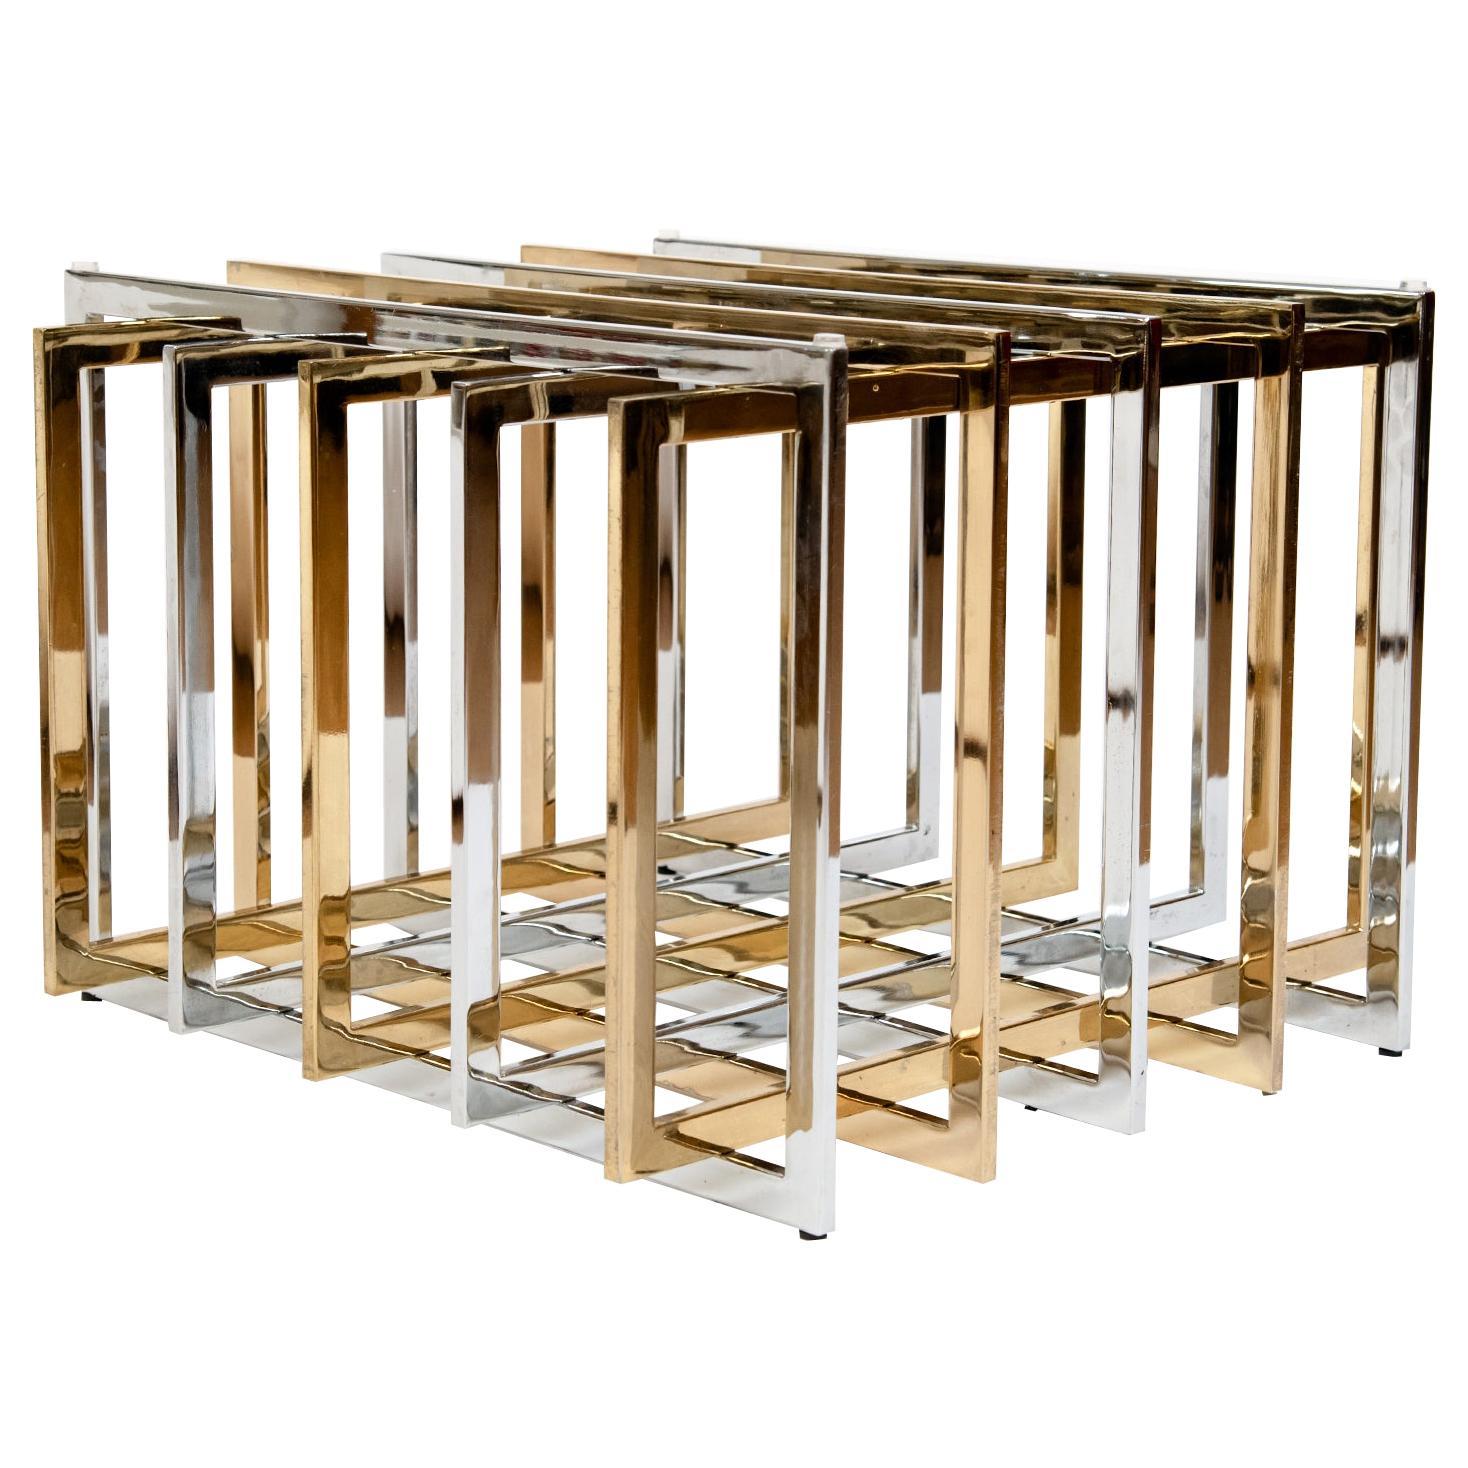 1970s Coffee Table Base by Pierre Cardin